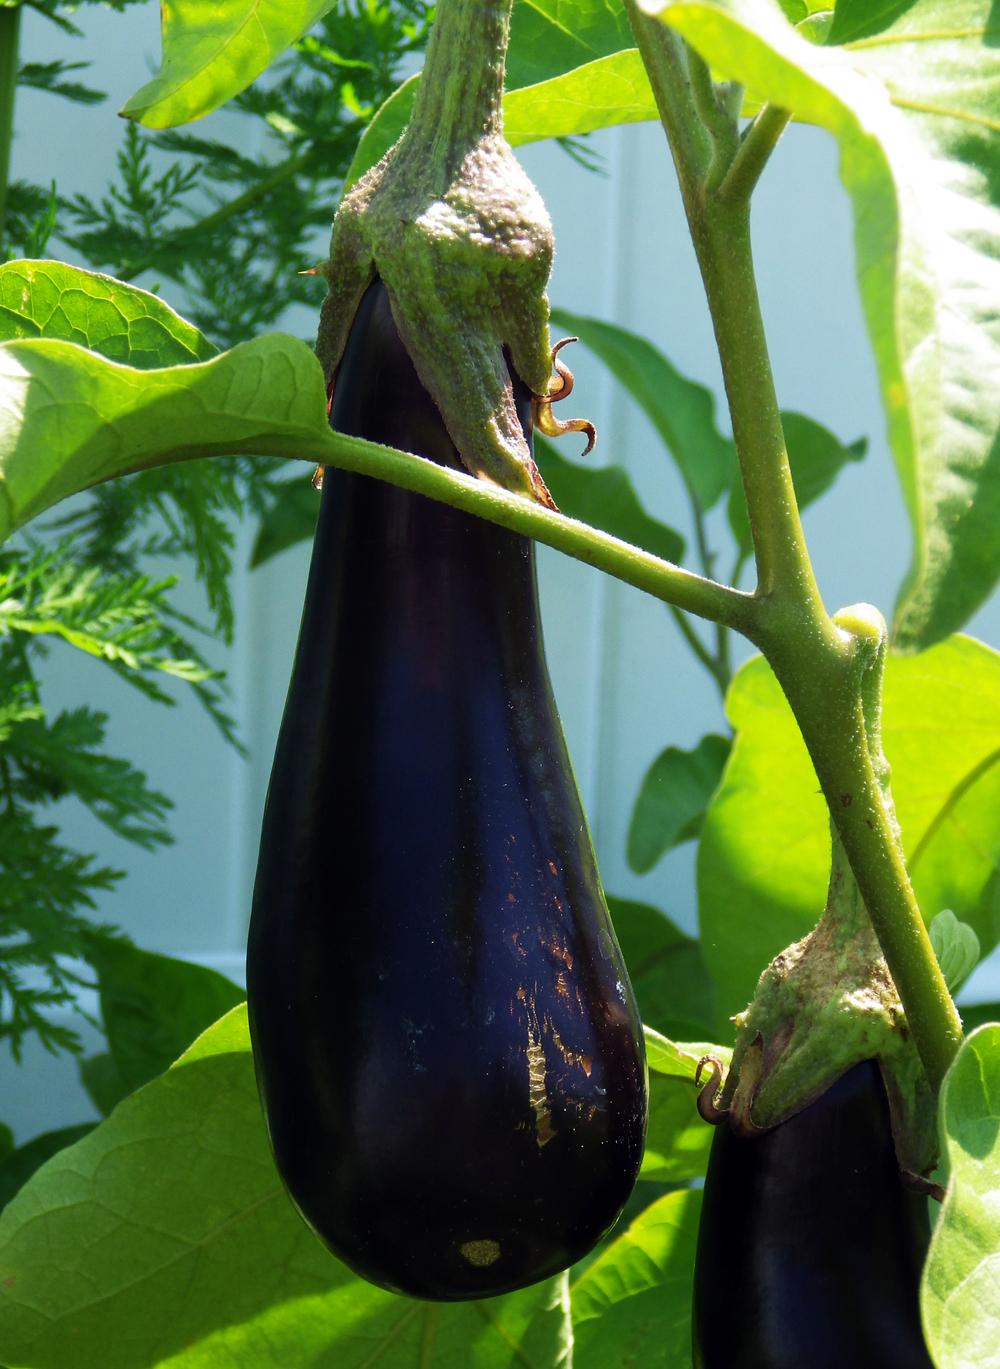 Eggplant2.jpg